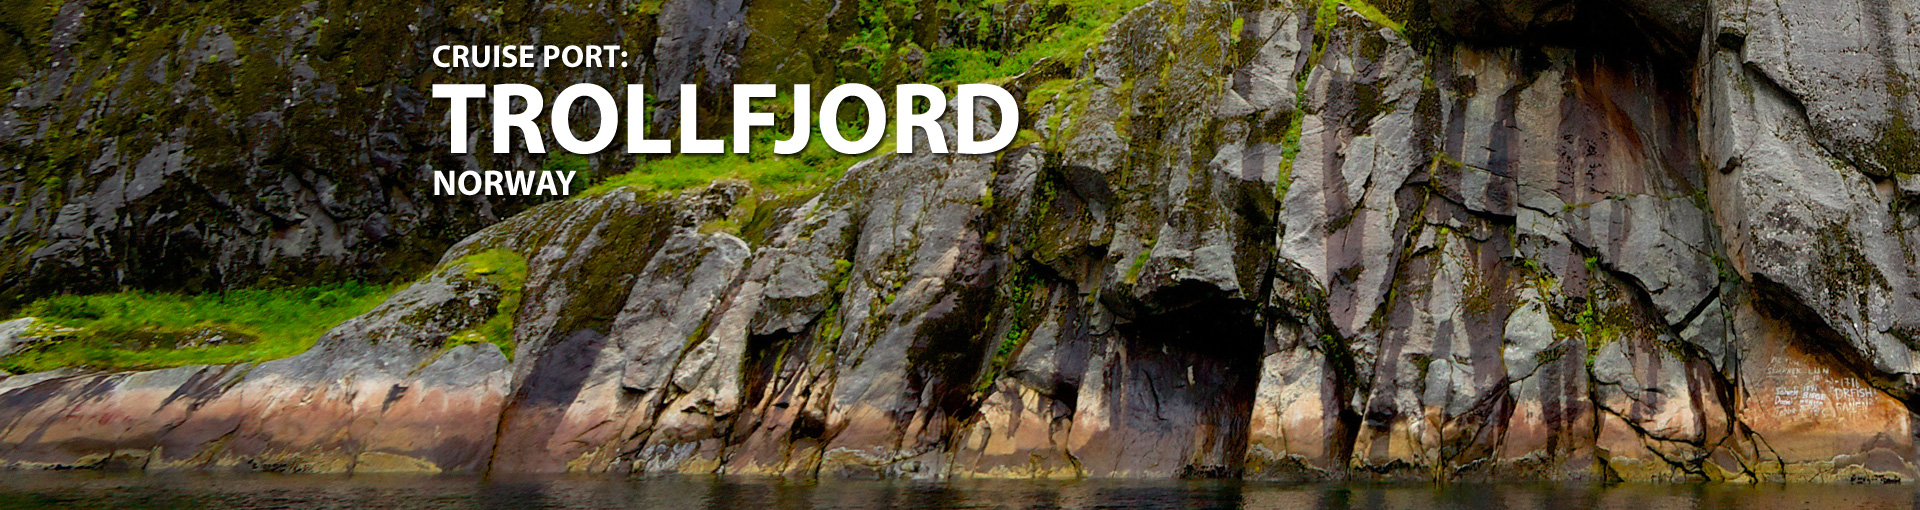 Cruises to Trollfjord, Norway